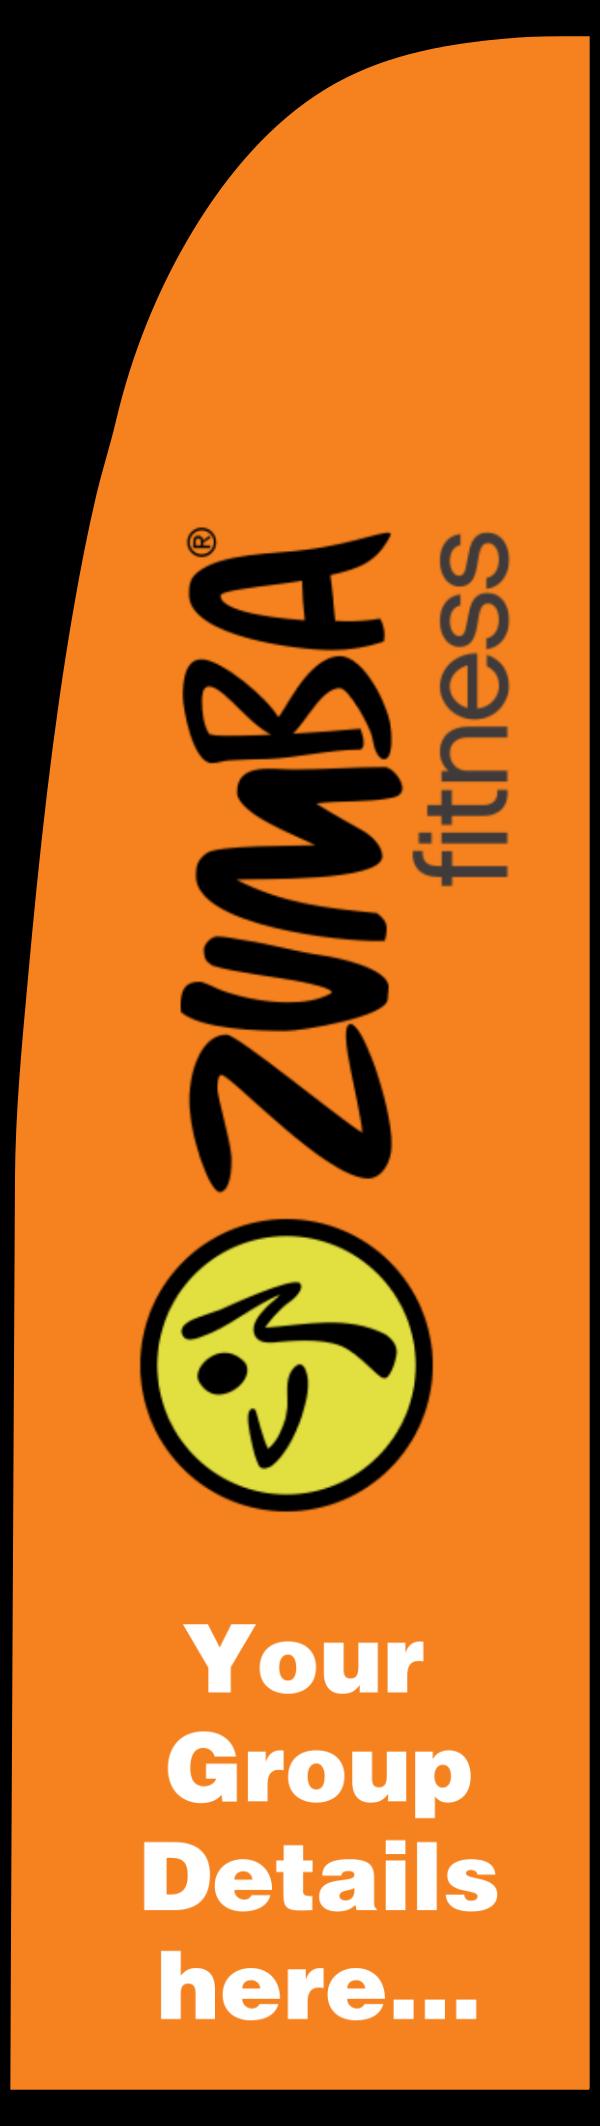 zumba_orange_flag - design template - 331